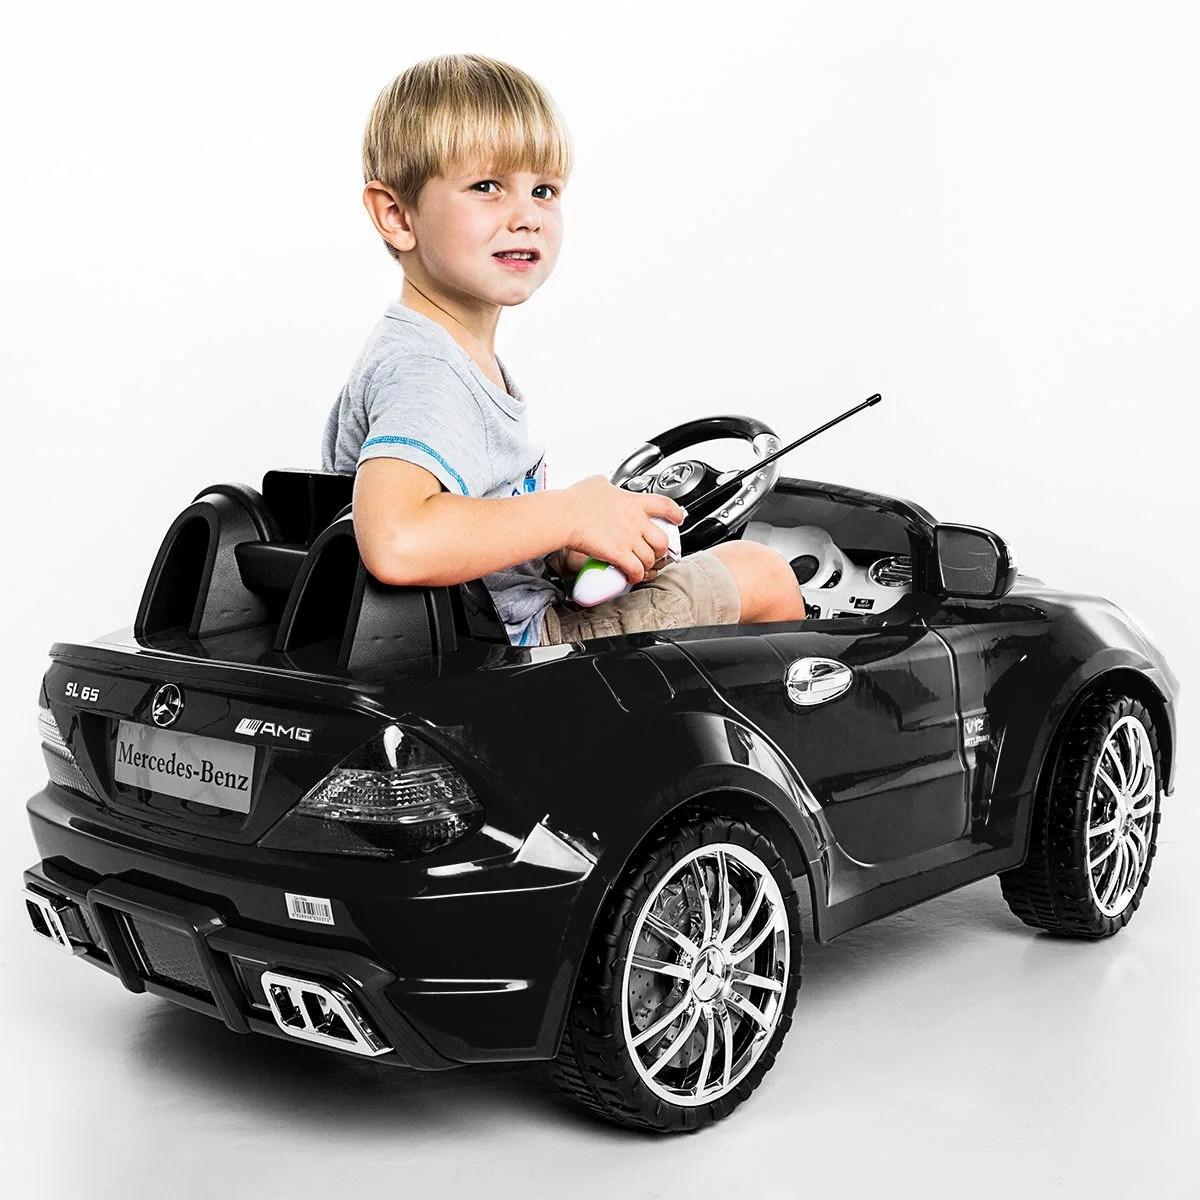 Costway Costway 12v Mercedes Benz Sl65 Electric Kids Ride